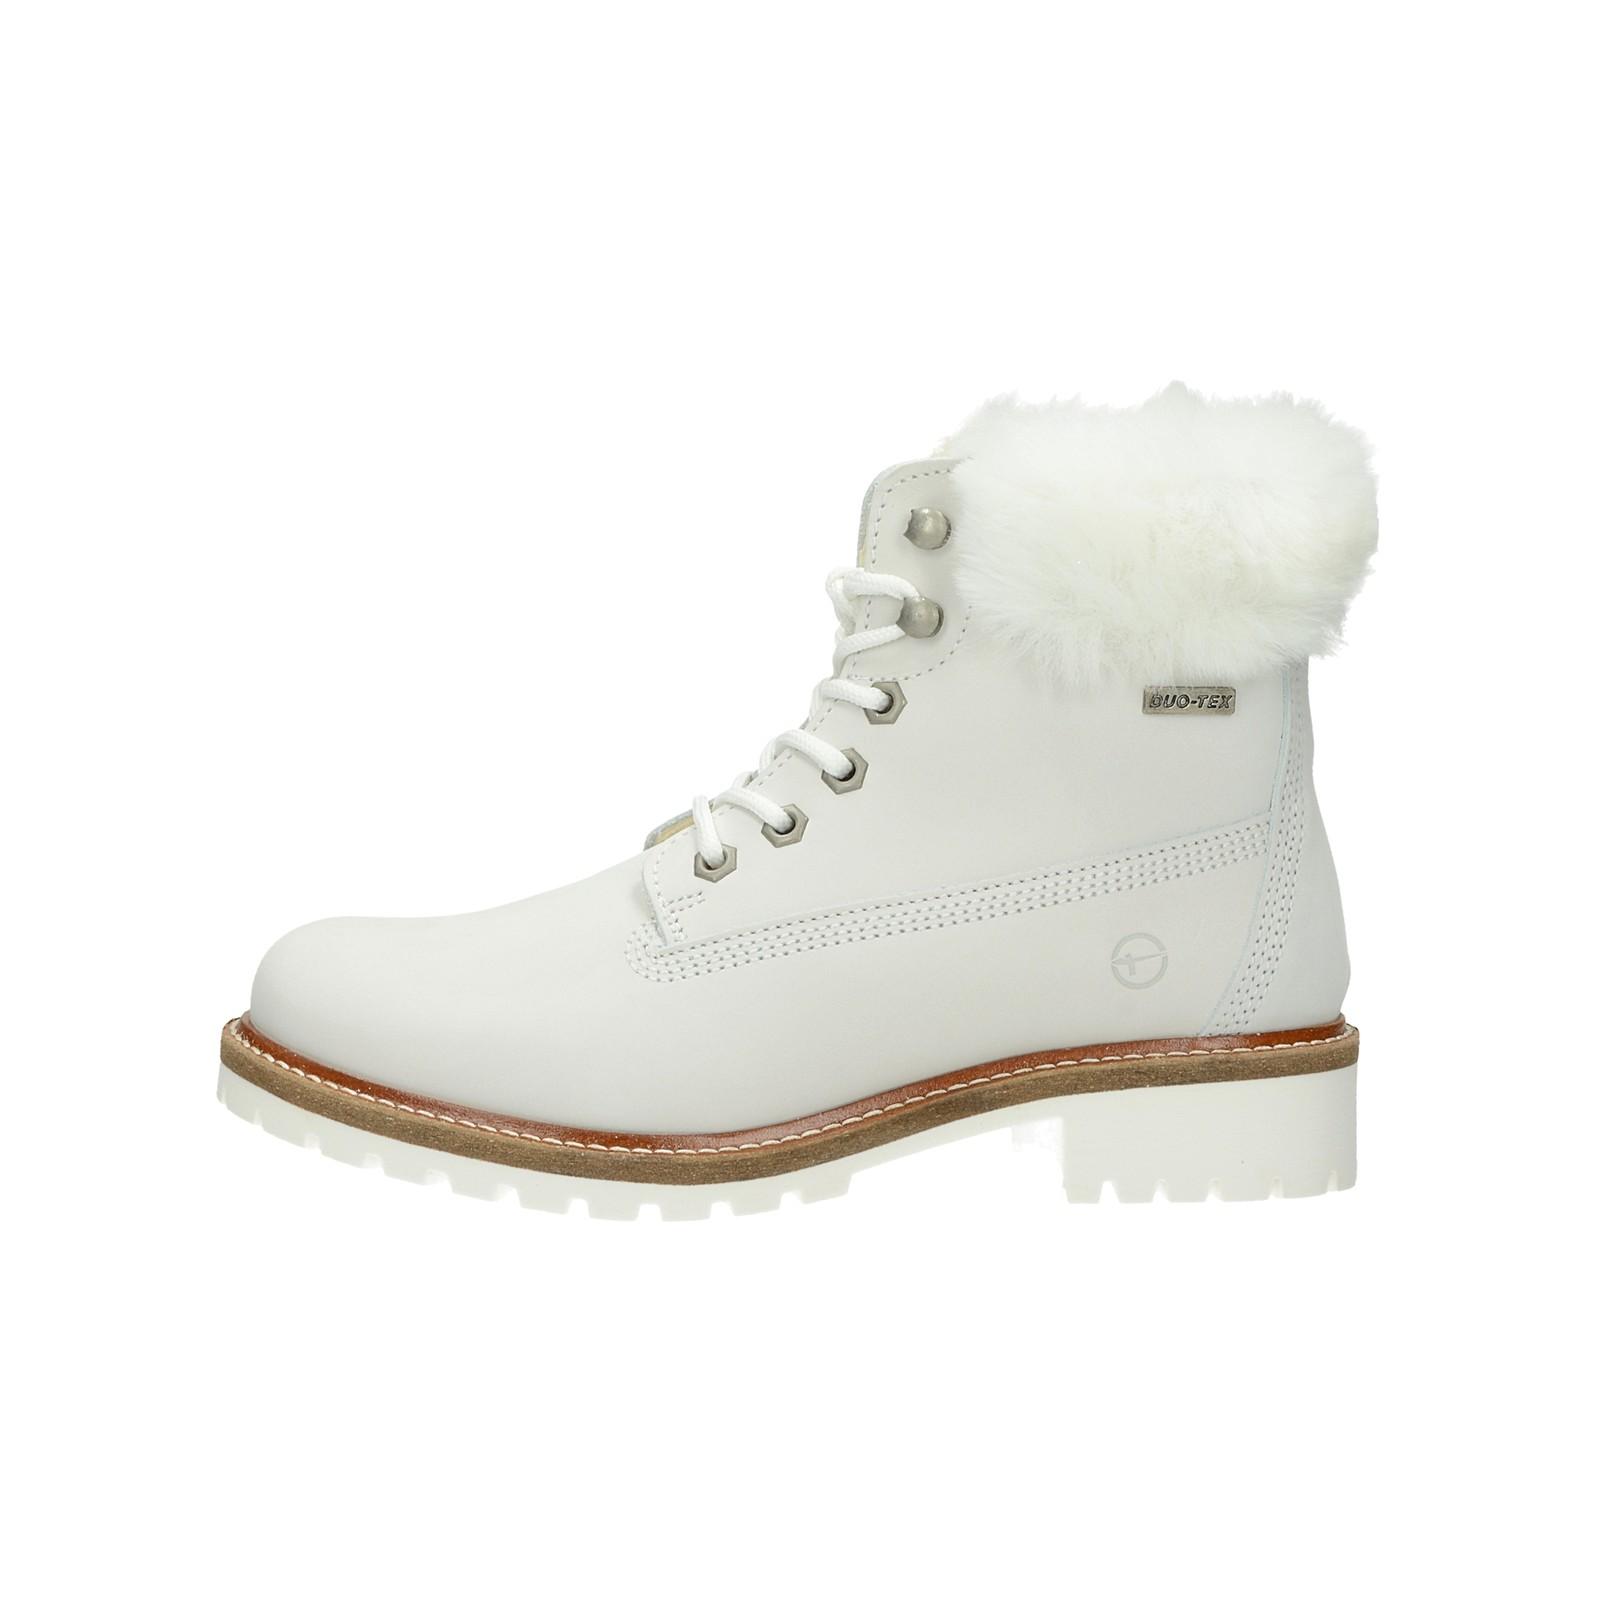 de0610168f29 ... Tamaris dámske štýlové nízke čižmy - biele ...